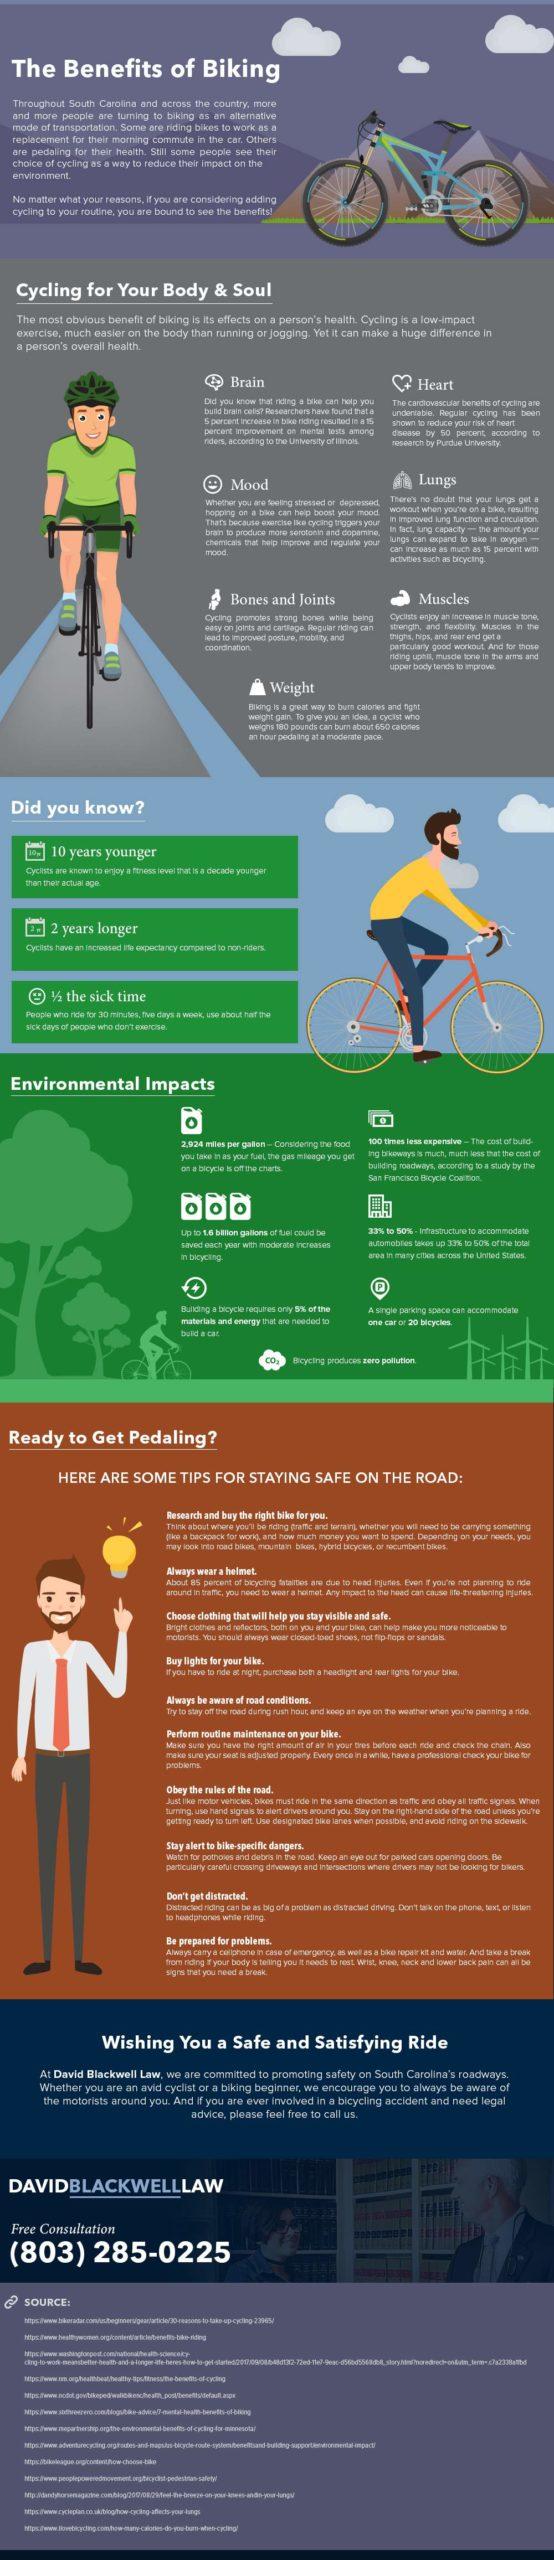 Benefits-of-biking